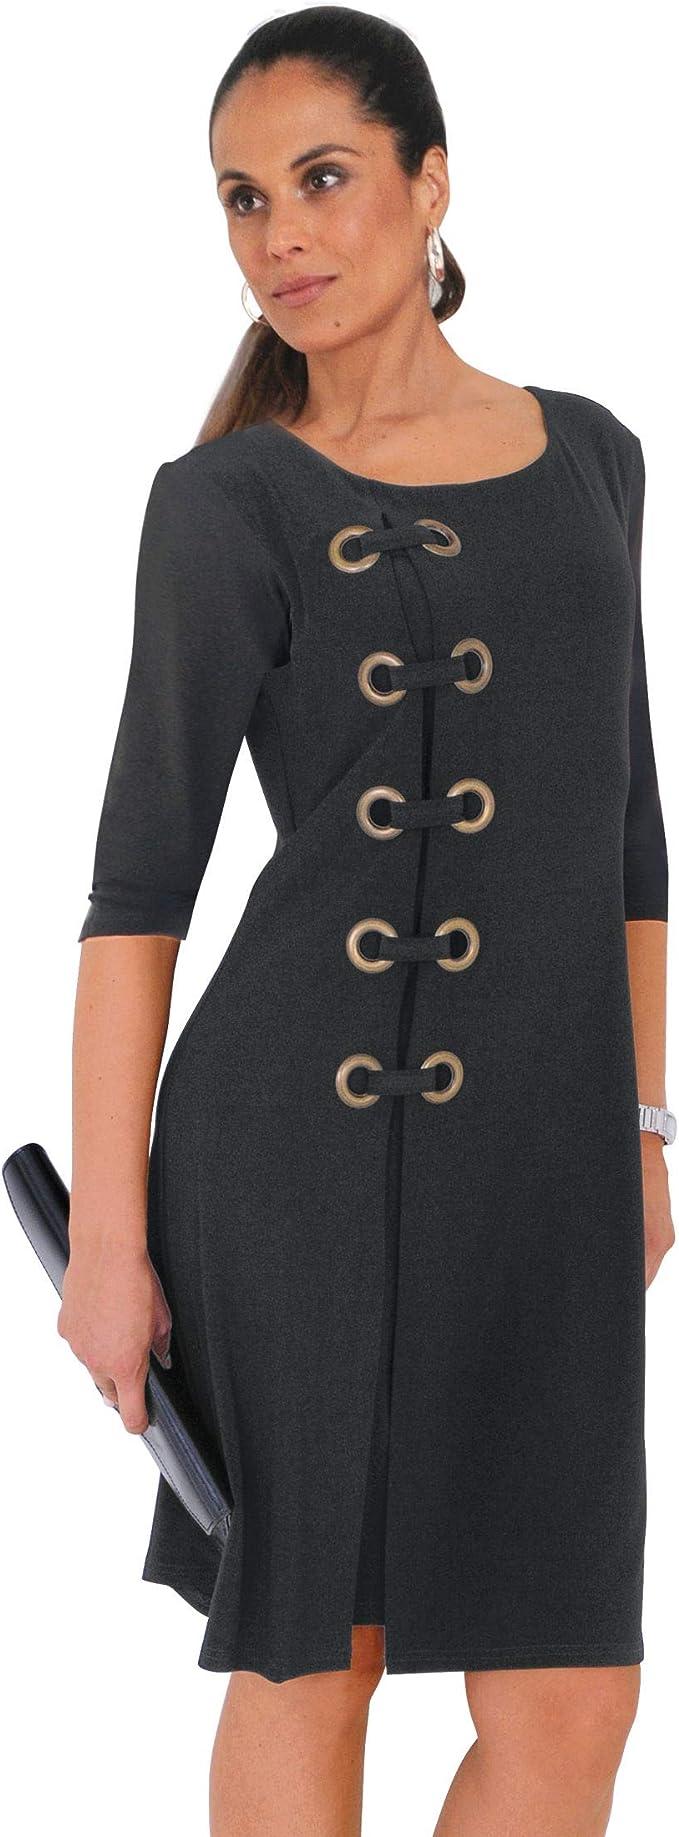 Joseph Ribkoff Kleid Tiana 184007x Fb 11 Amazon De Bekleidung